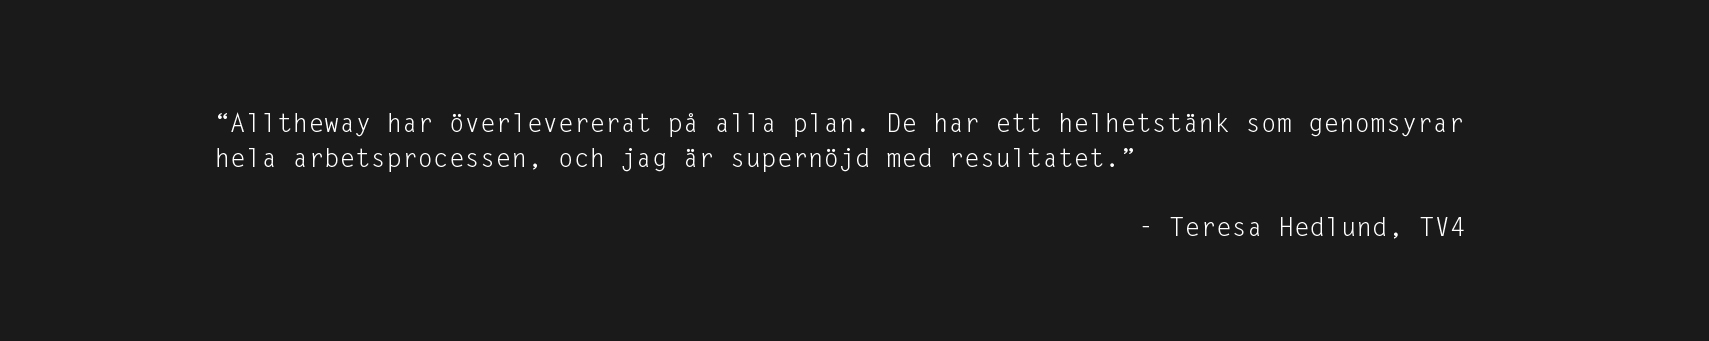 citat3.jpg